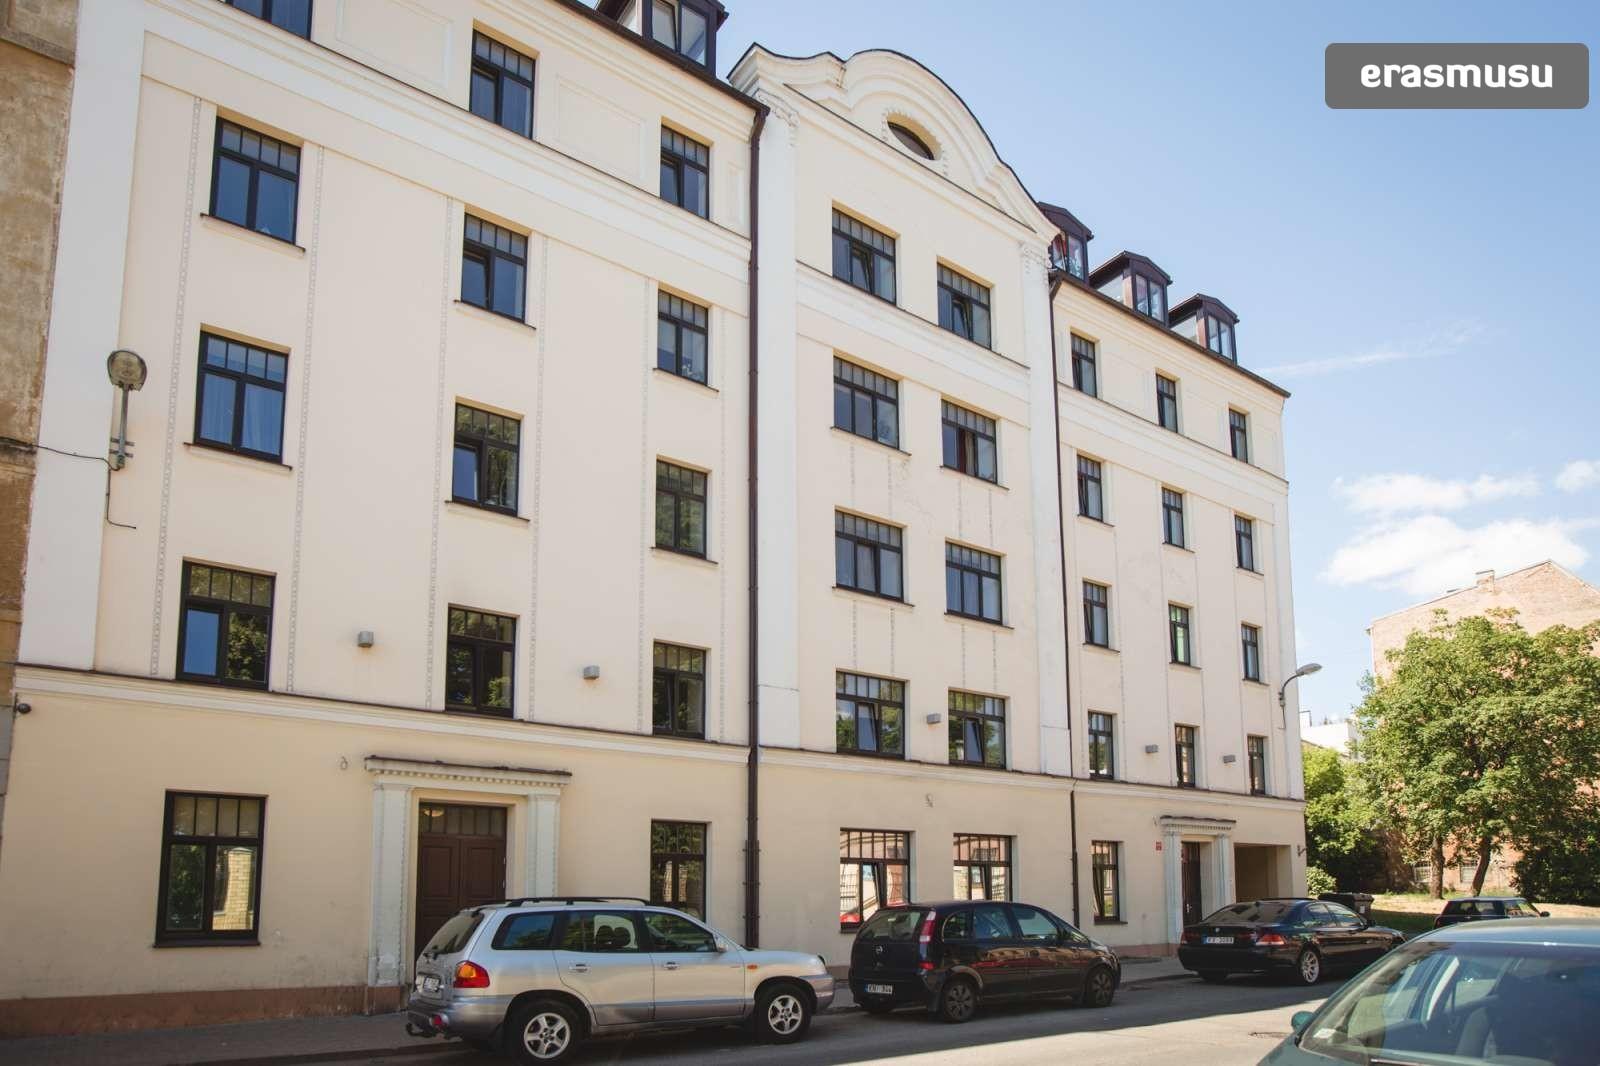 1-bedroom-apartment-rent-maskavas-forstate-60ca66c2f5e97f64b2fe5